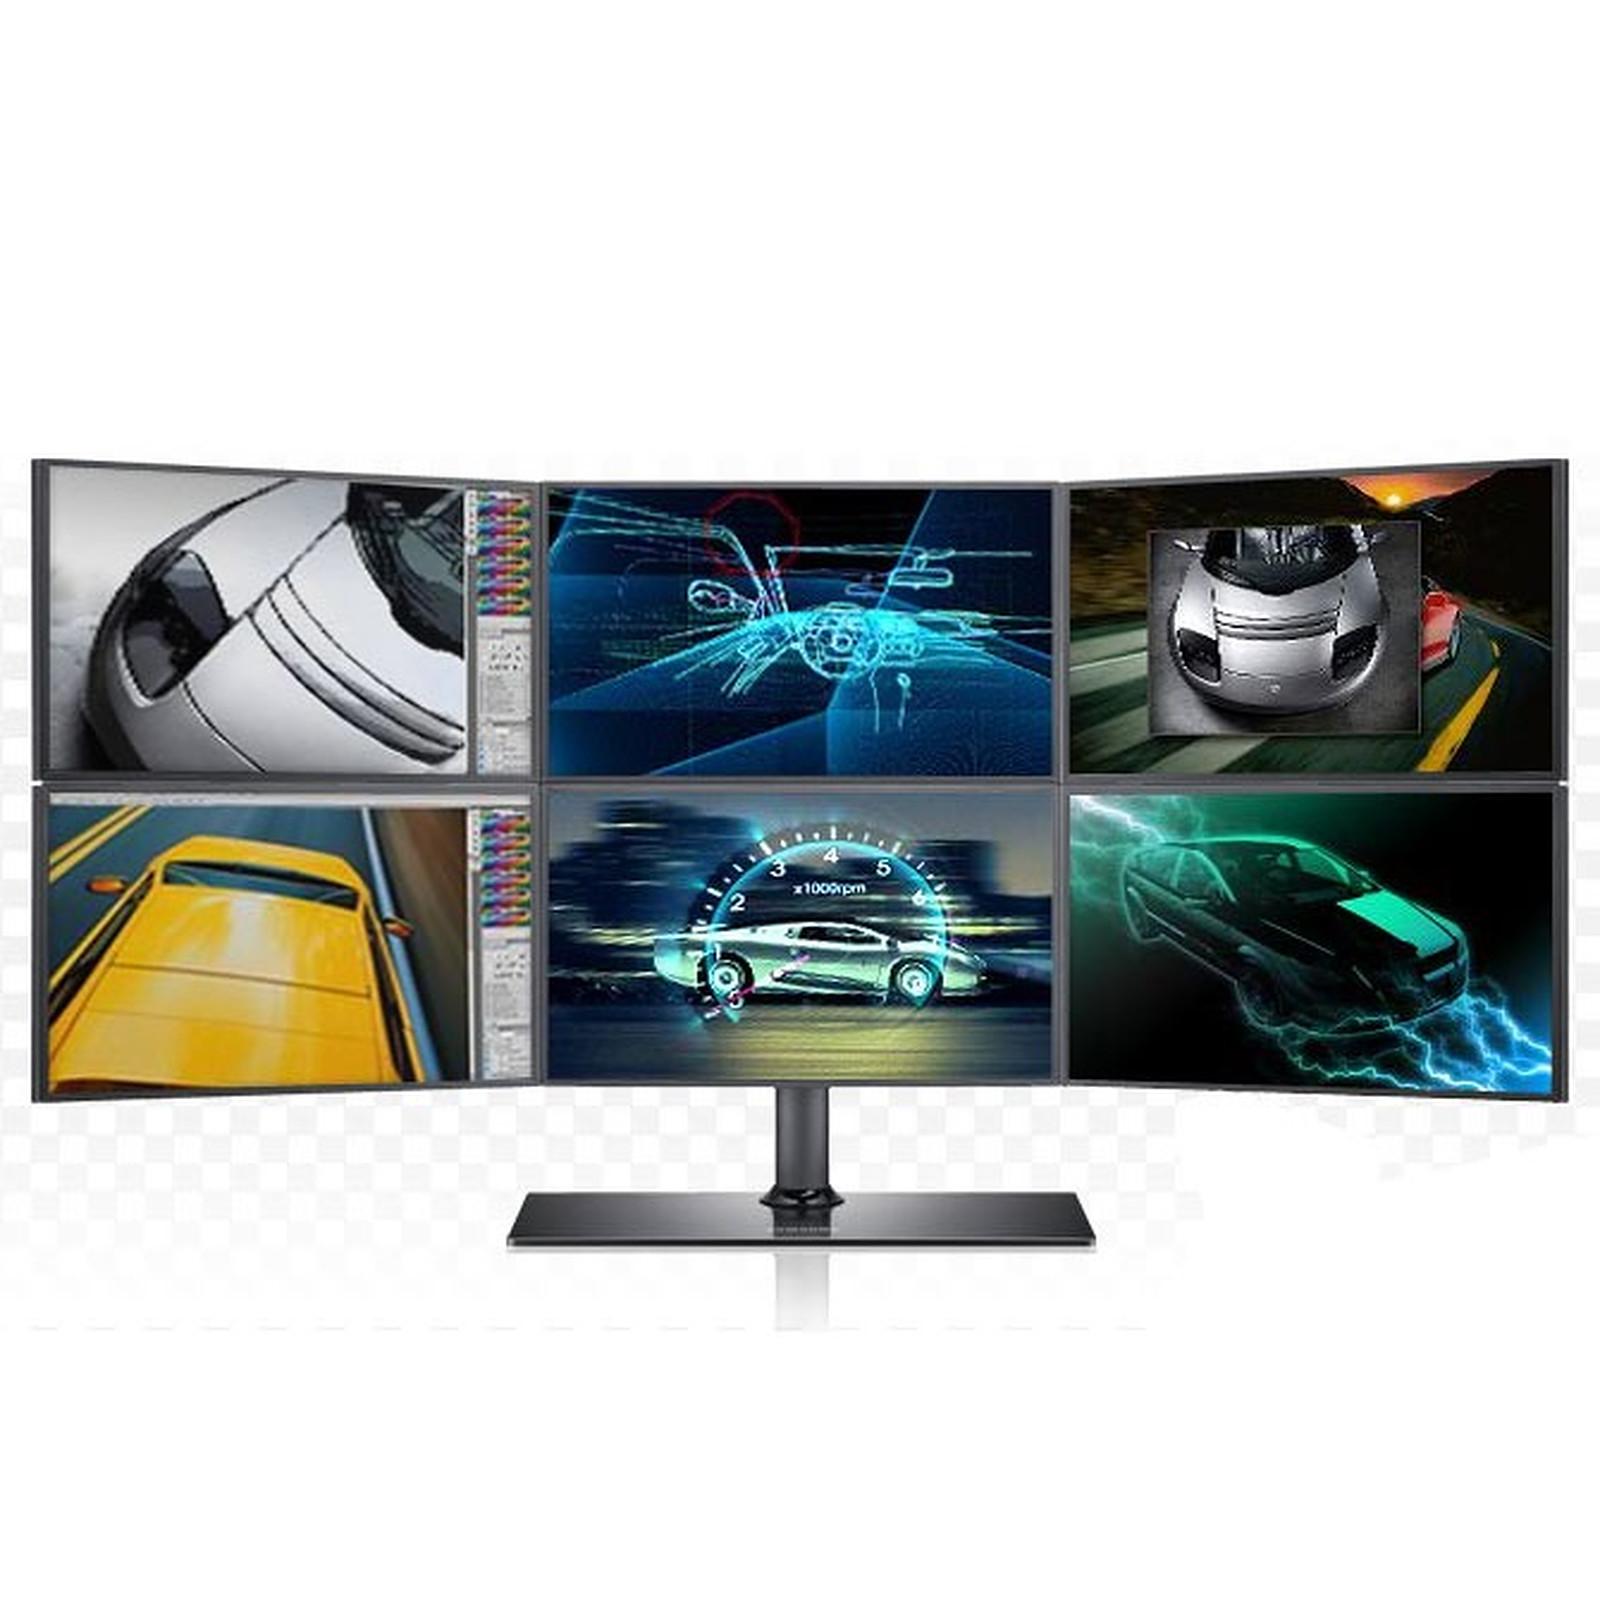 "Samsung 6x 23"" LCD - SyncMaster MD230x6"